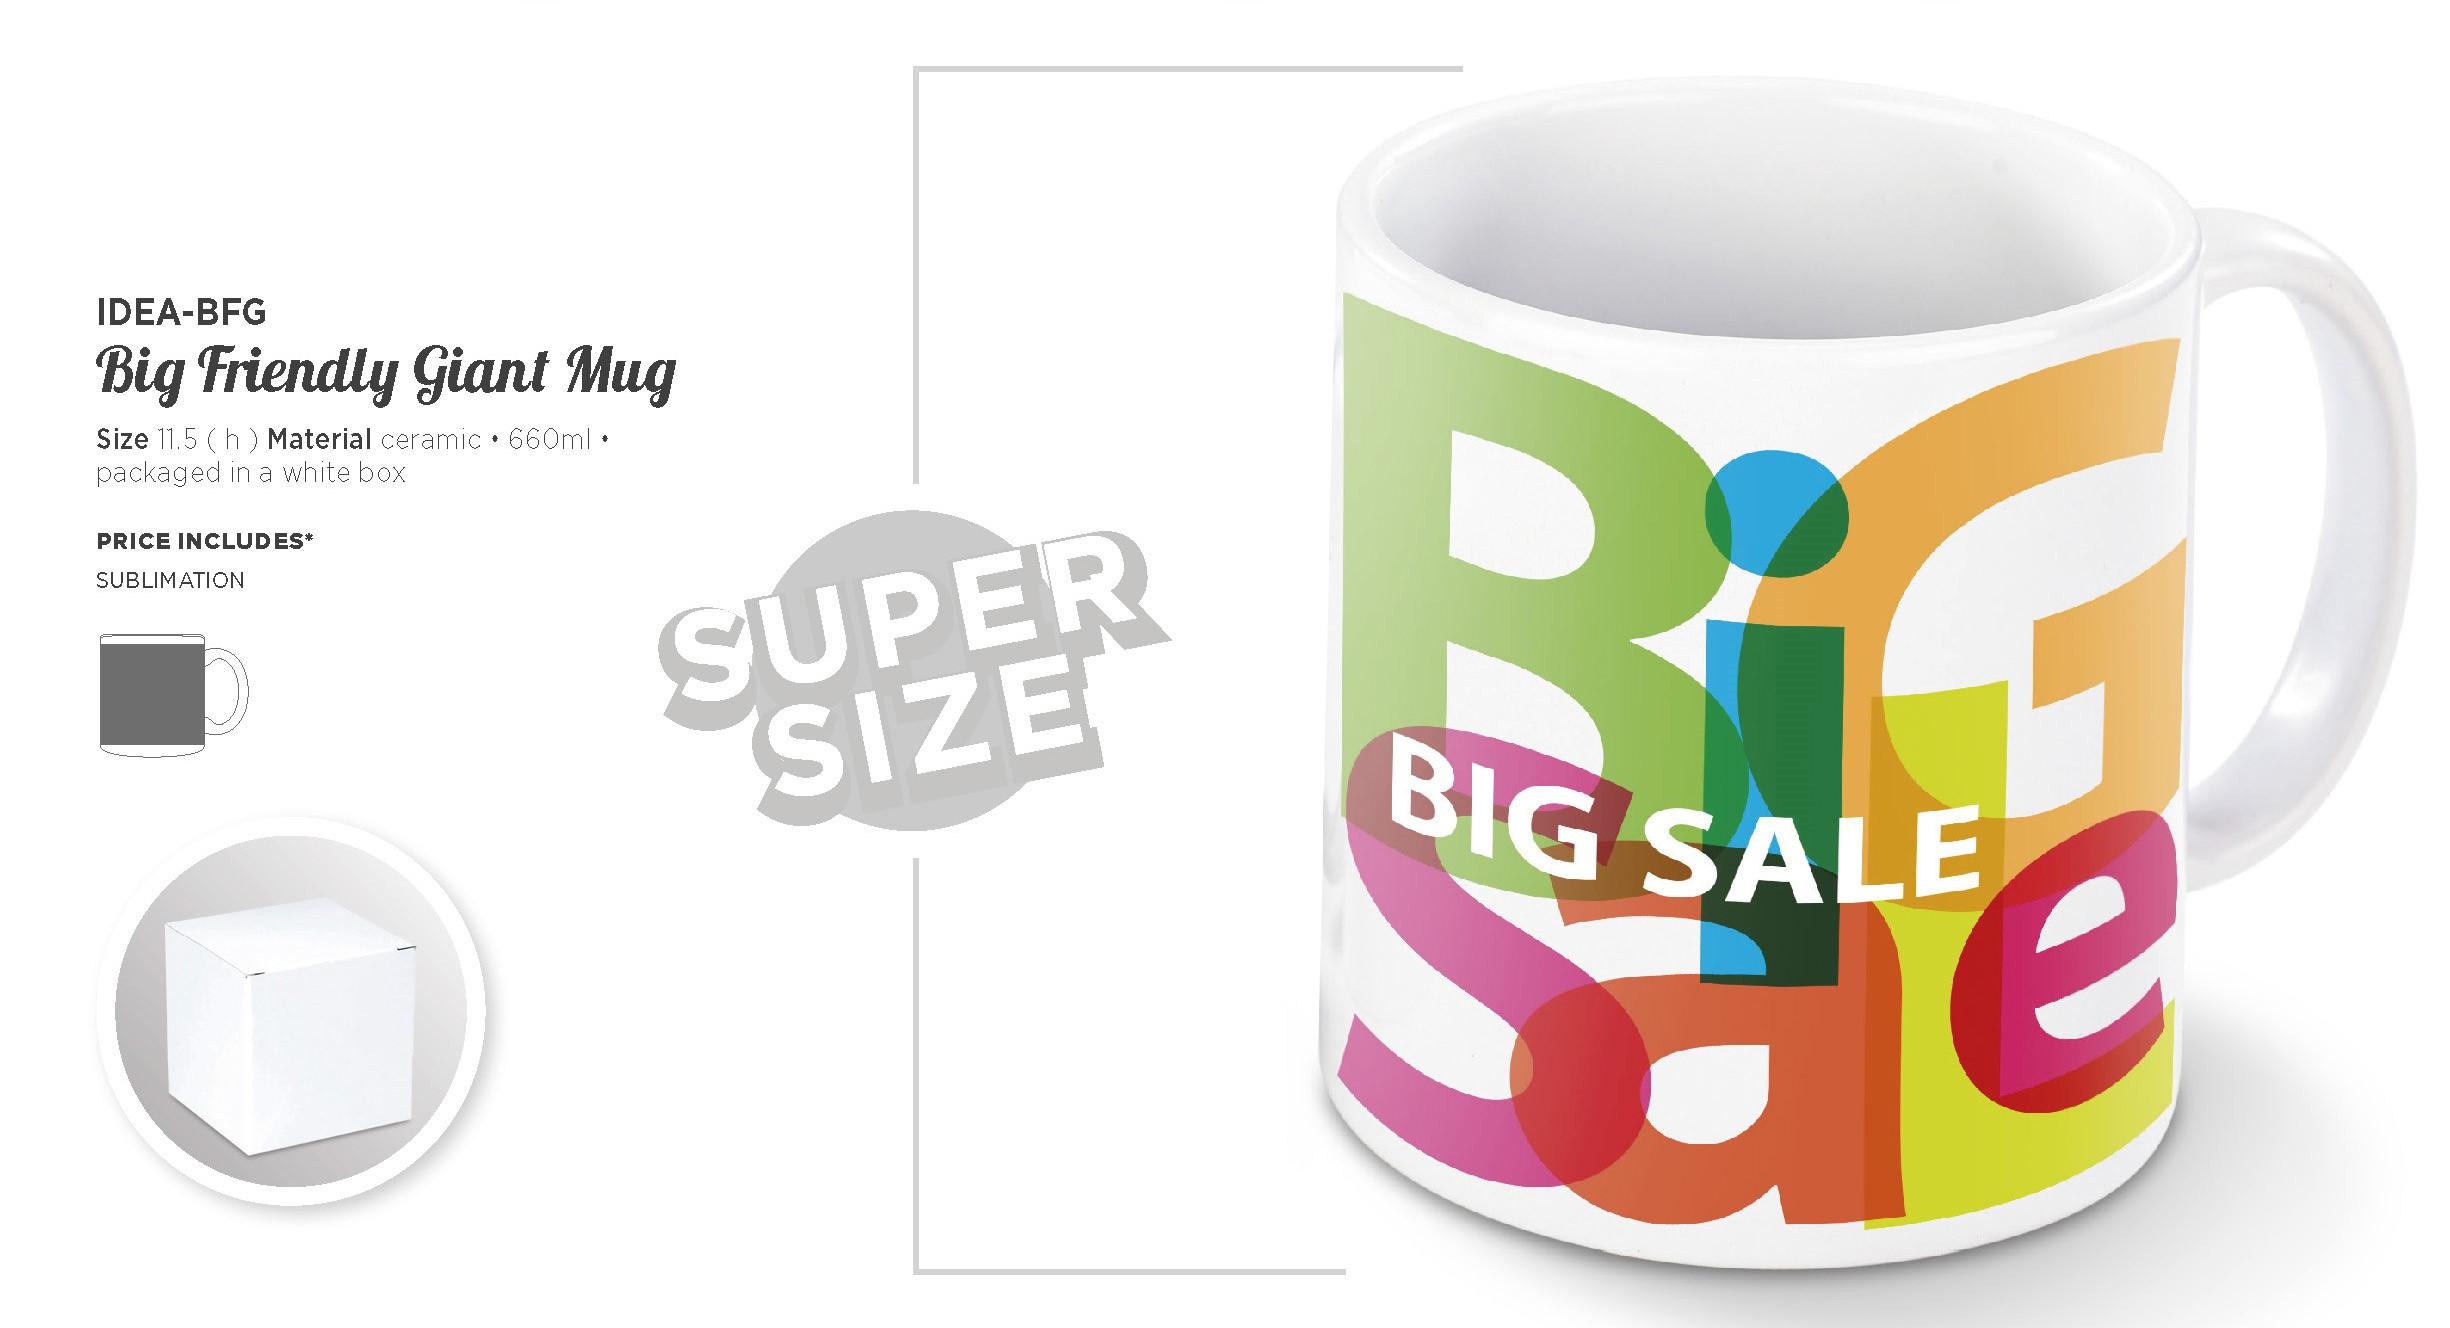 Product: Big Friendly Giant Mug - 660ml